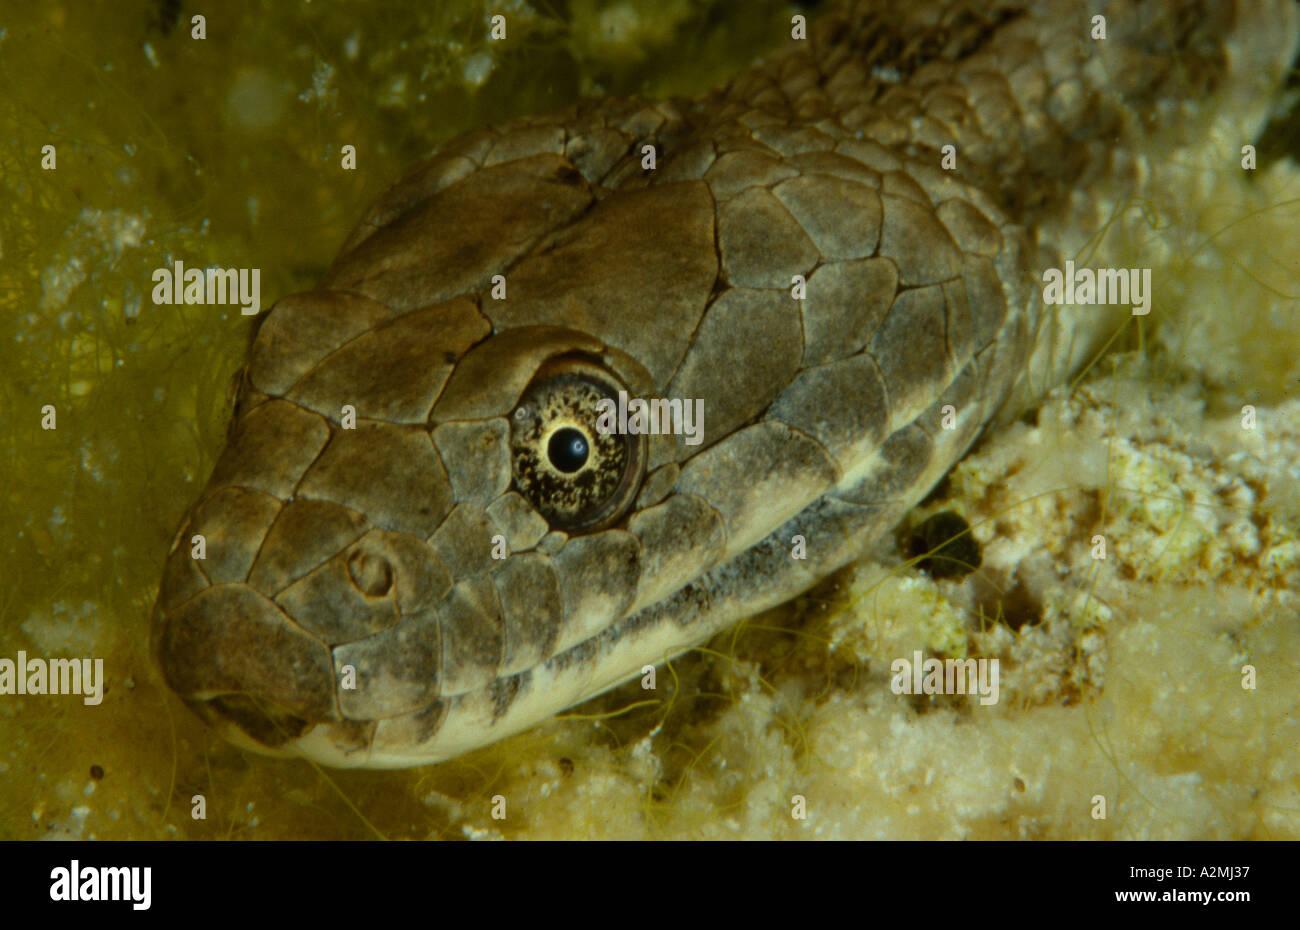 Dice Snake natrix tessellata underwater - Stock Image